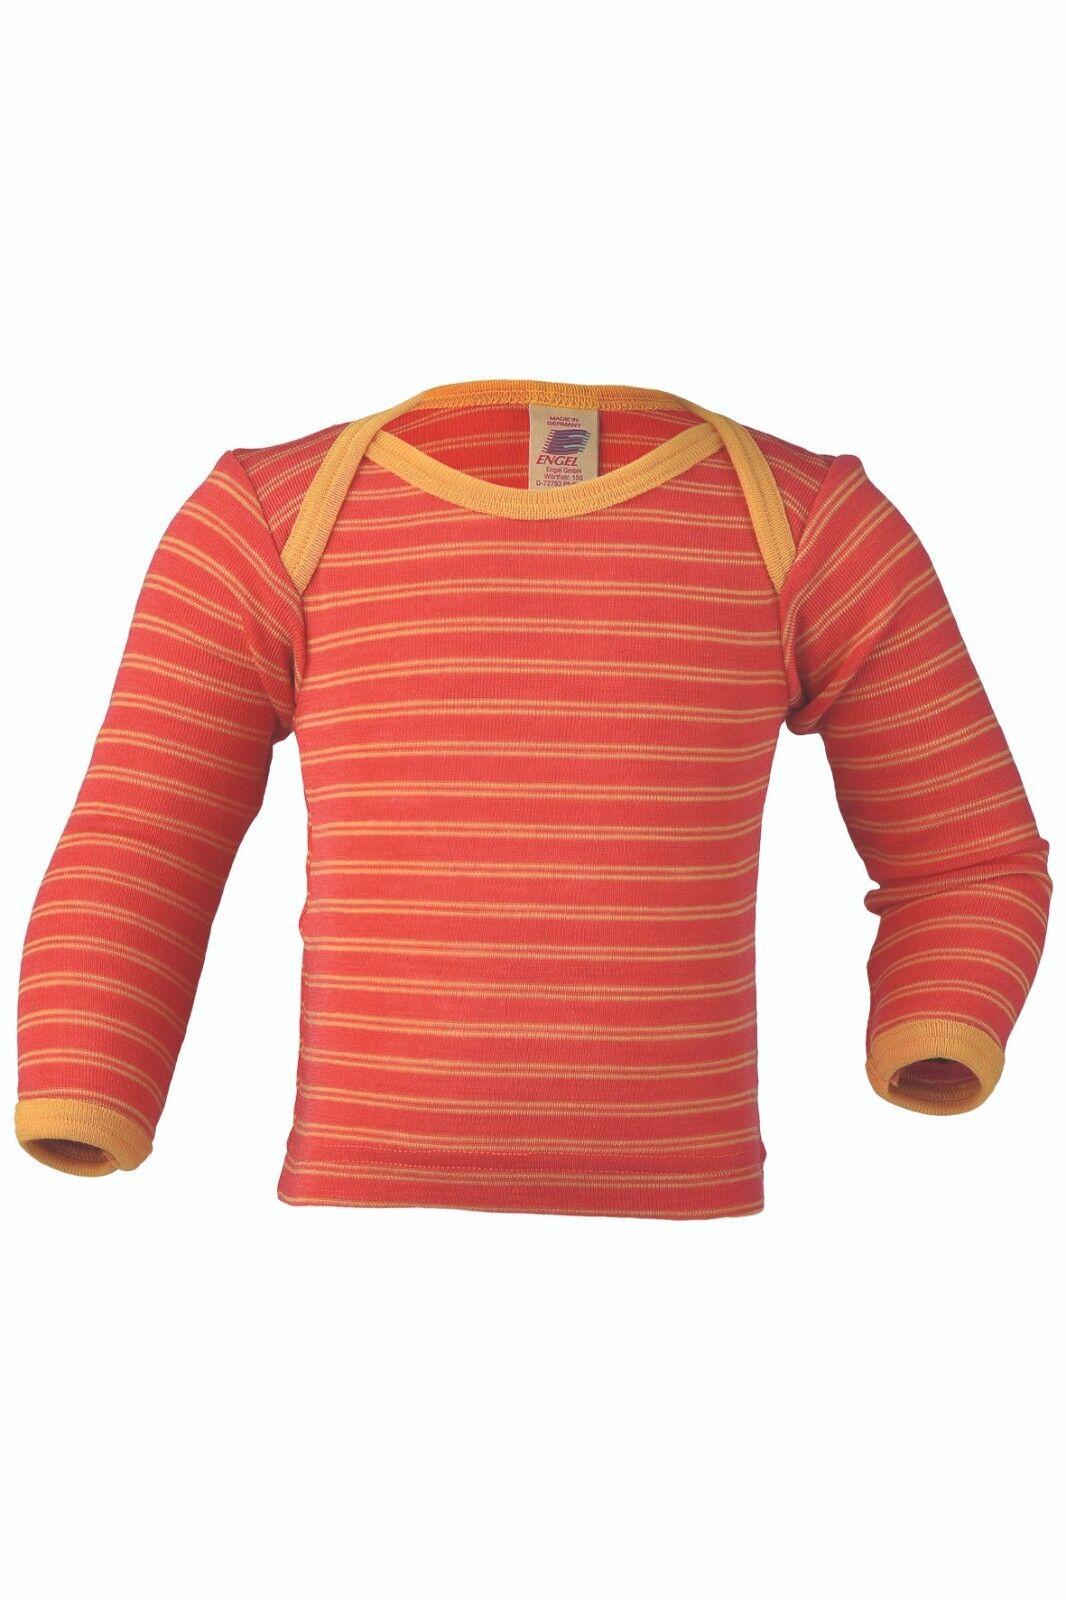 f470f38995 Engel 100 Merino Wool Striped Baby T-shirt Thermo Underwear 74/80 ...